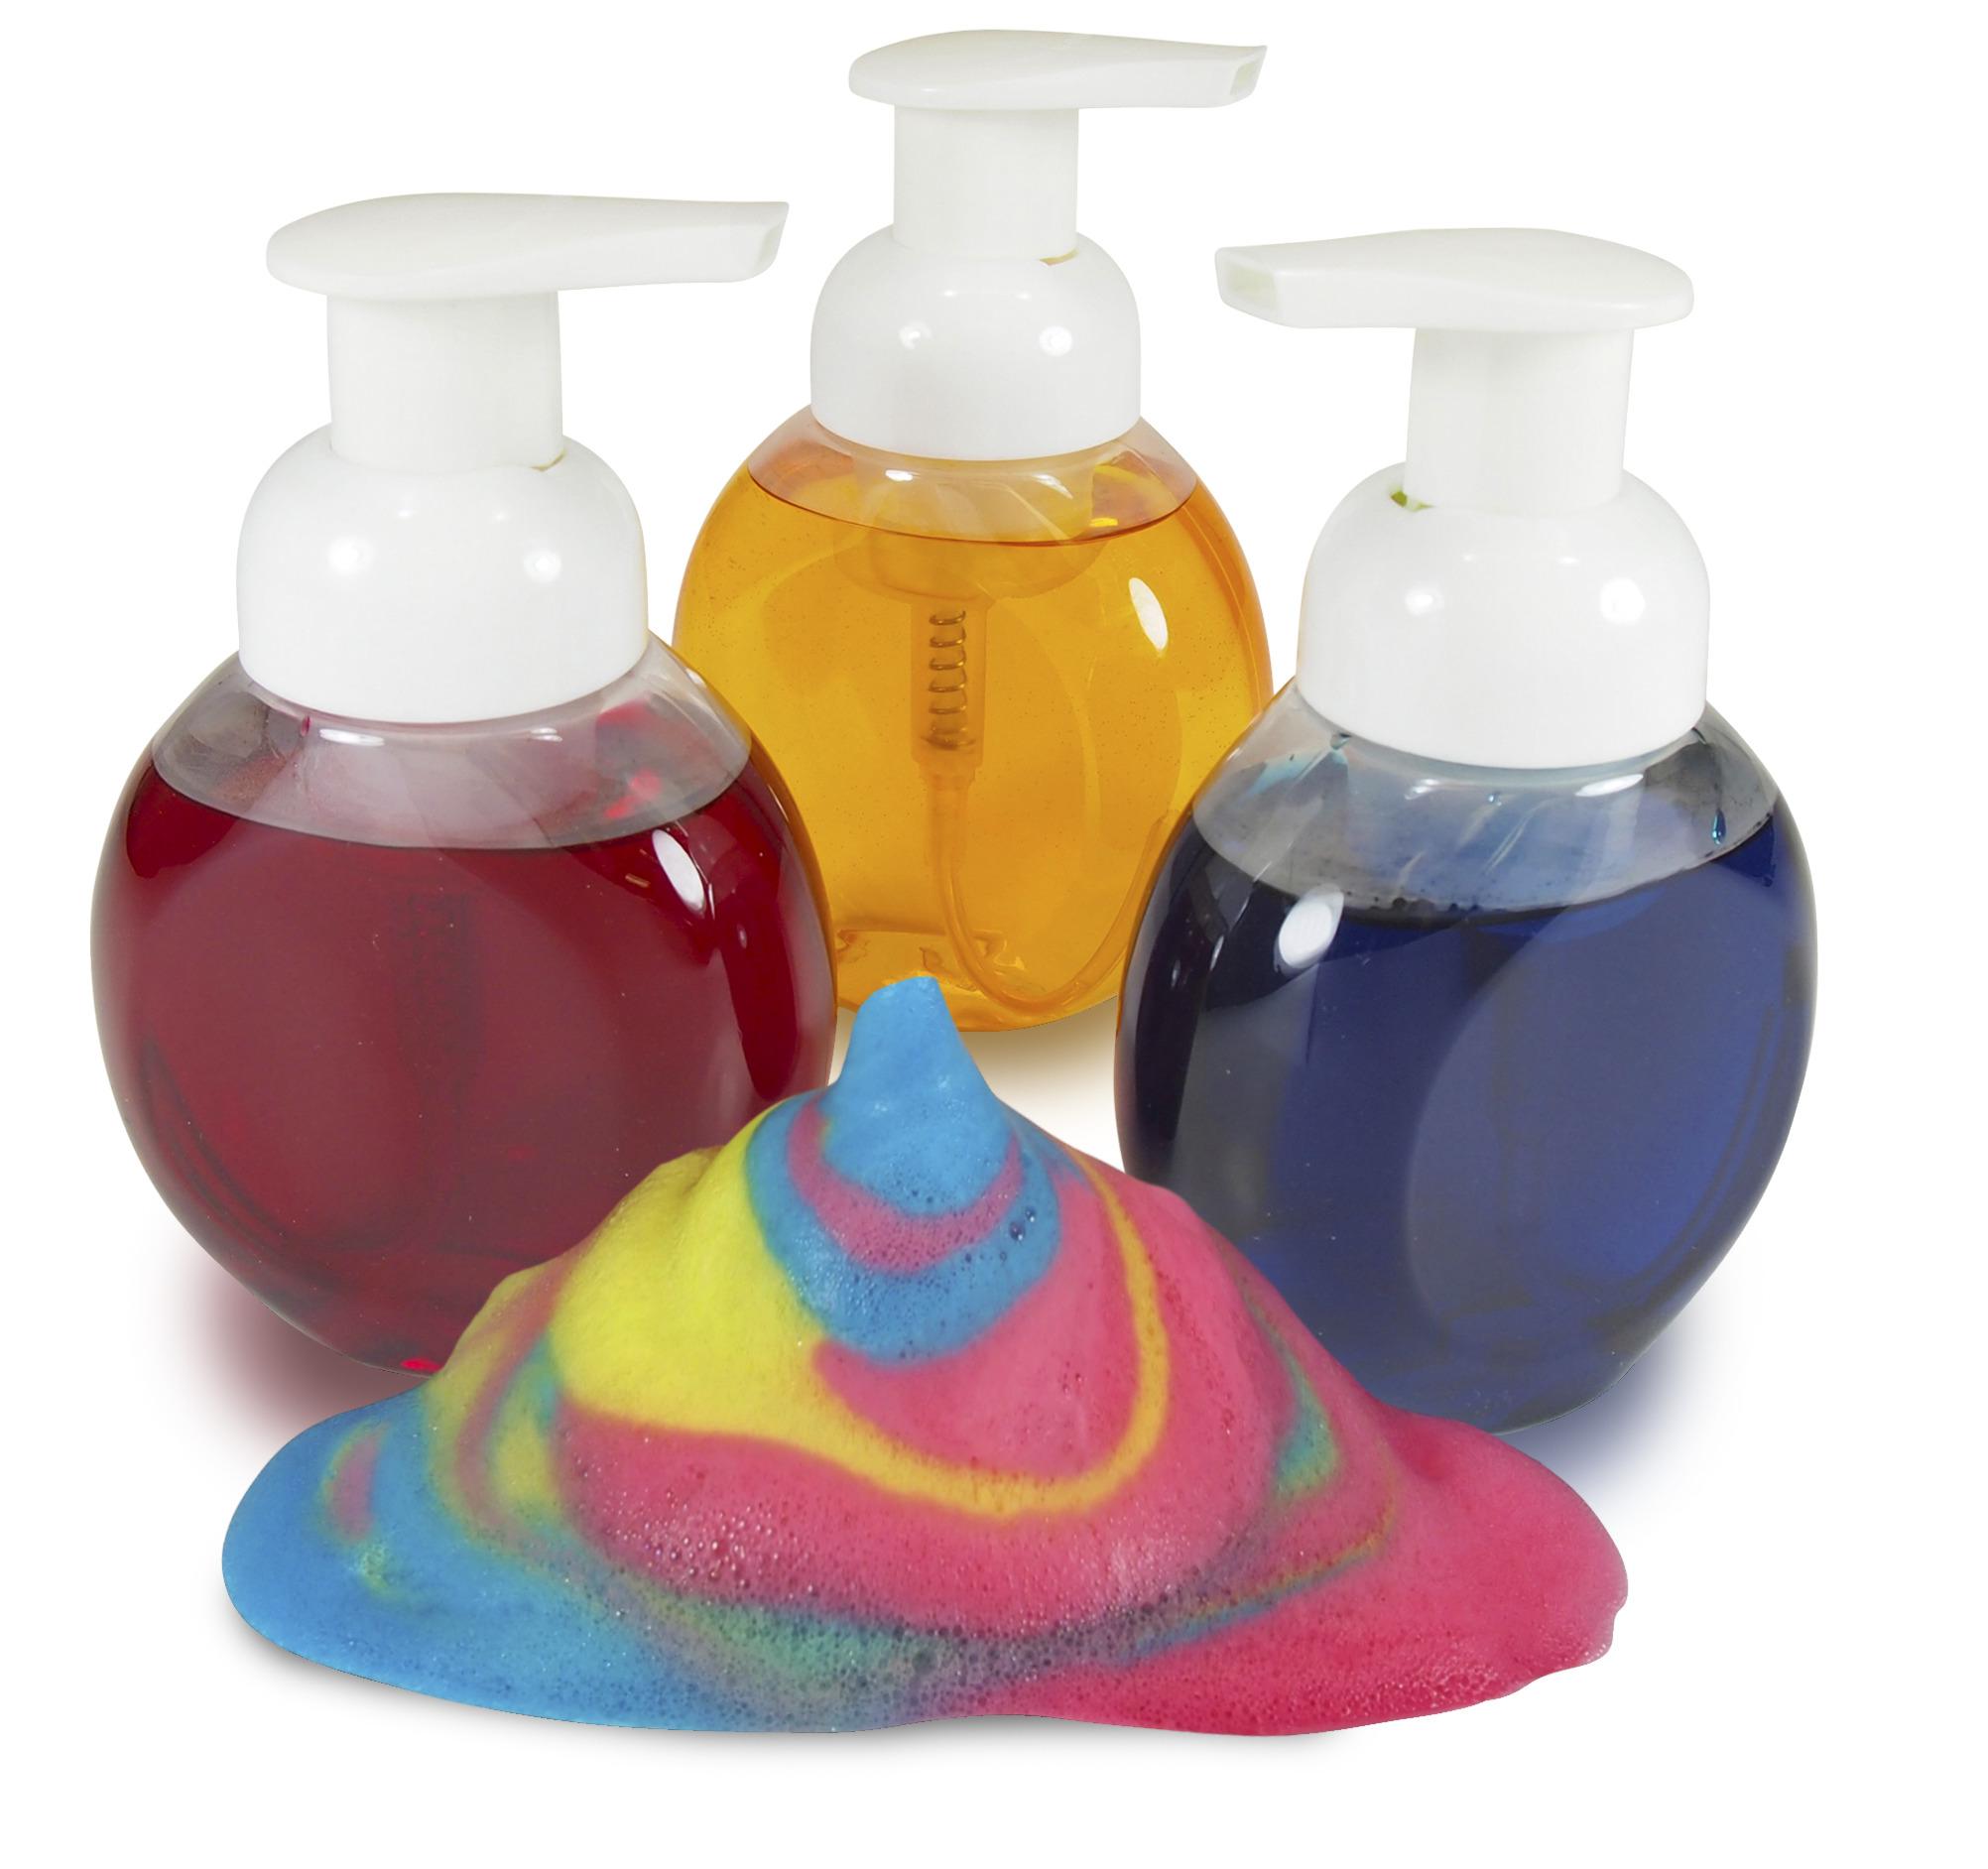 Roylco Foam Paint Bottles, Pack of 3